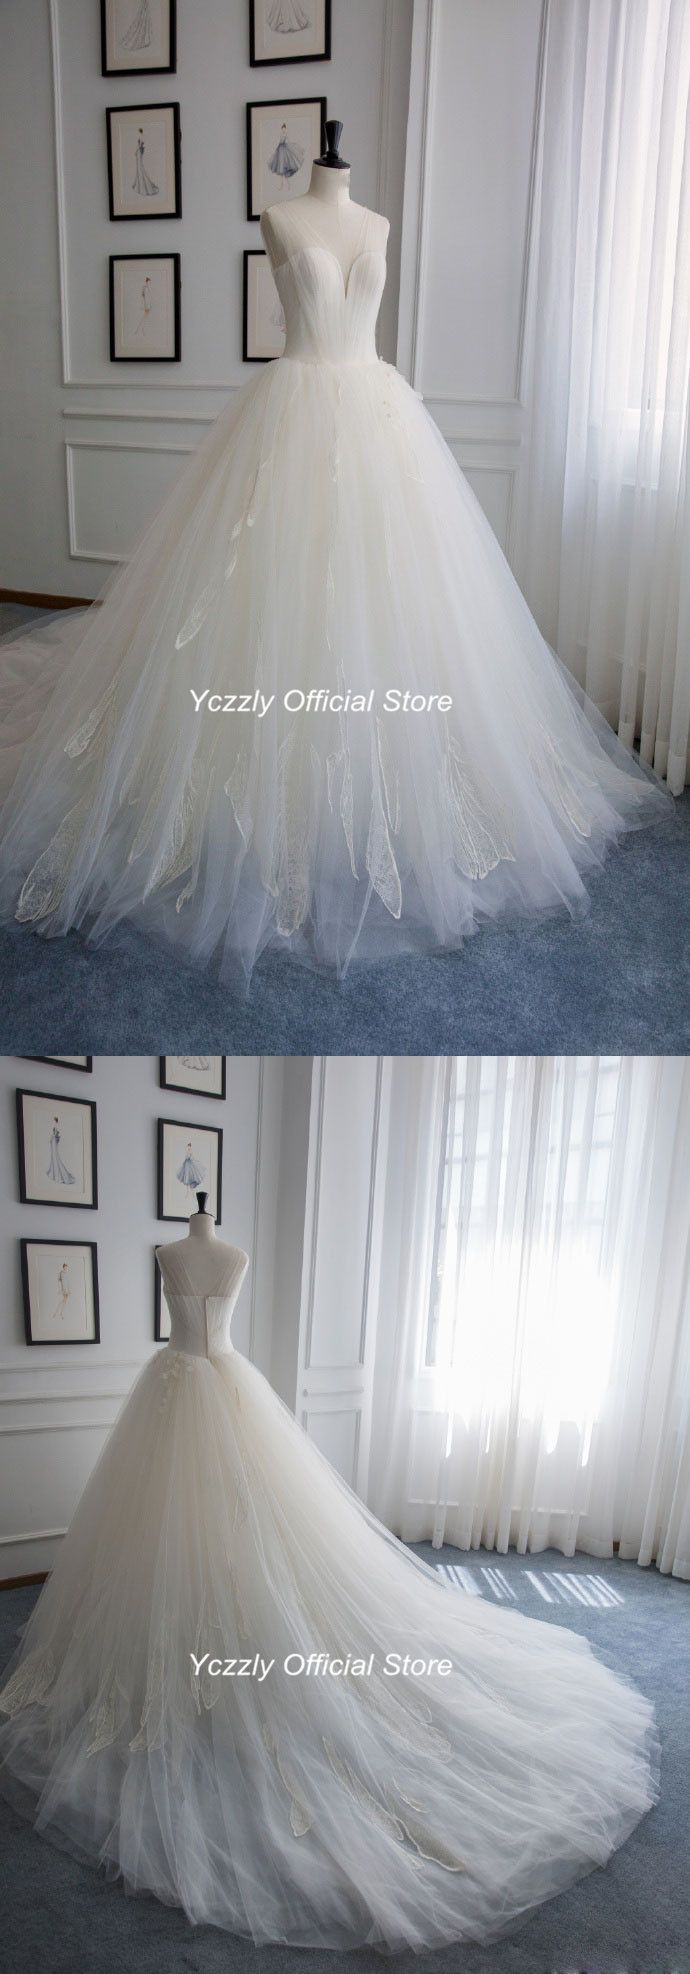 ball gown wedding dress#puffy wedding dress#princess wedding dress#v ...